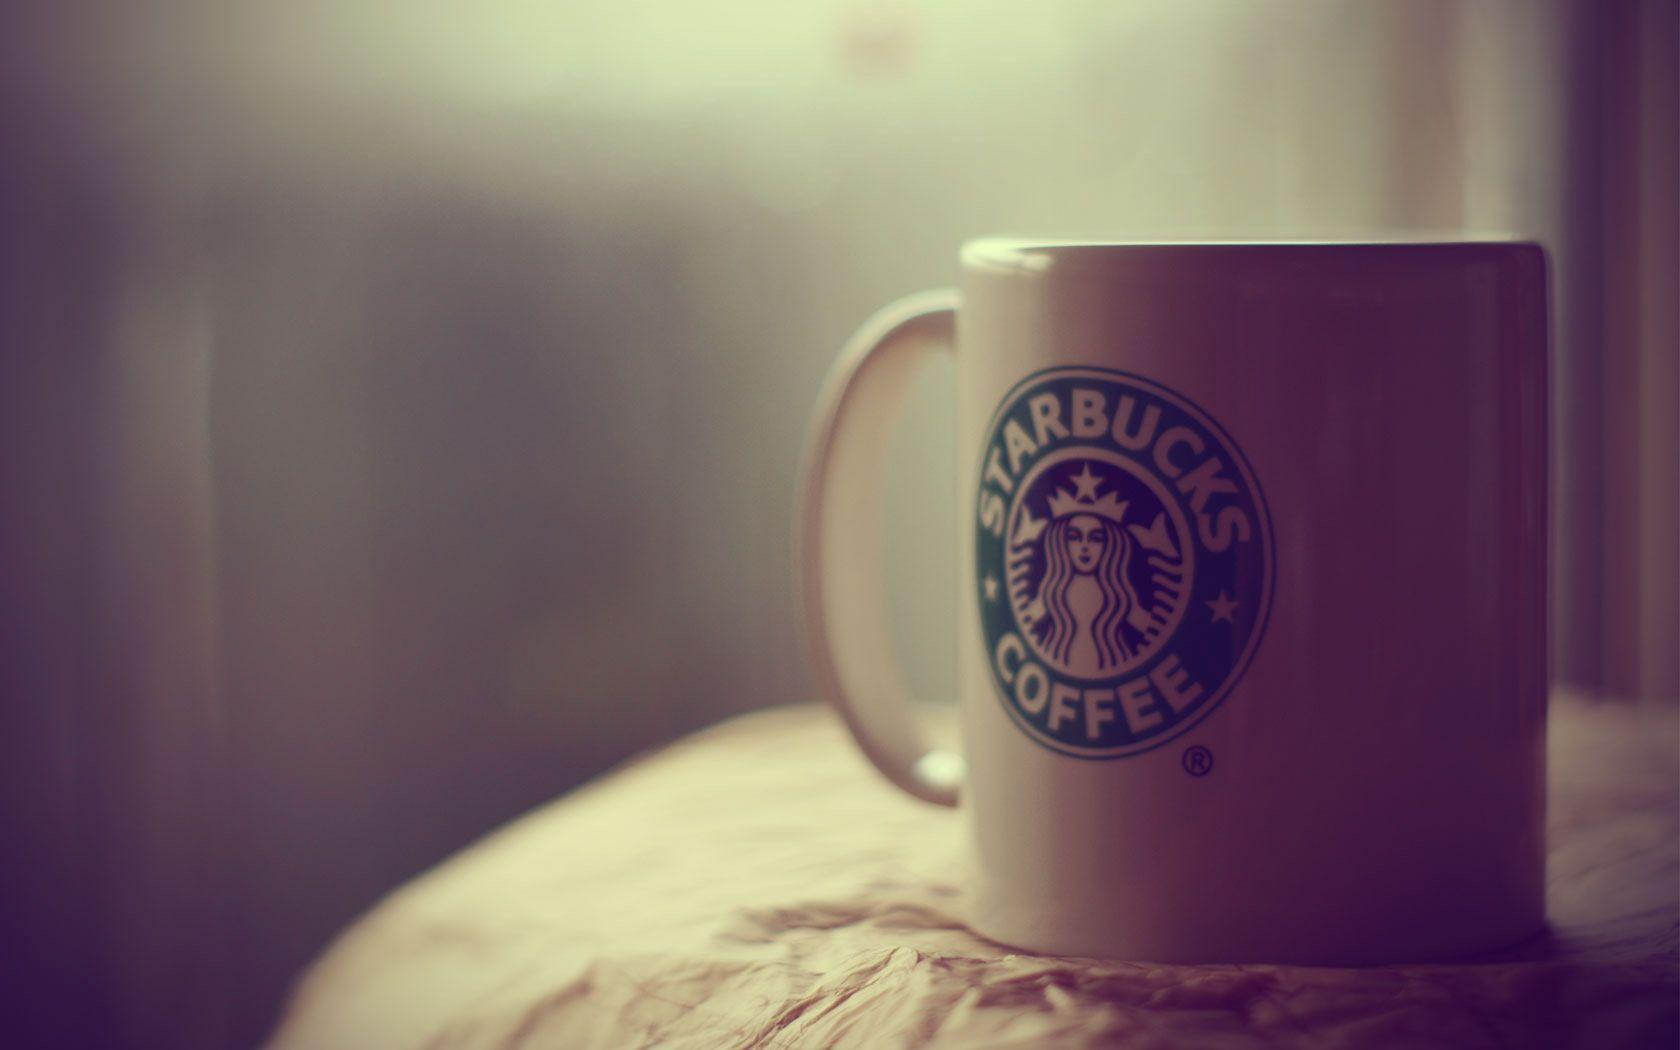 Starbucks Coffee Wallpapers Wallpaper Cave